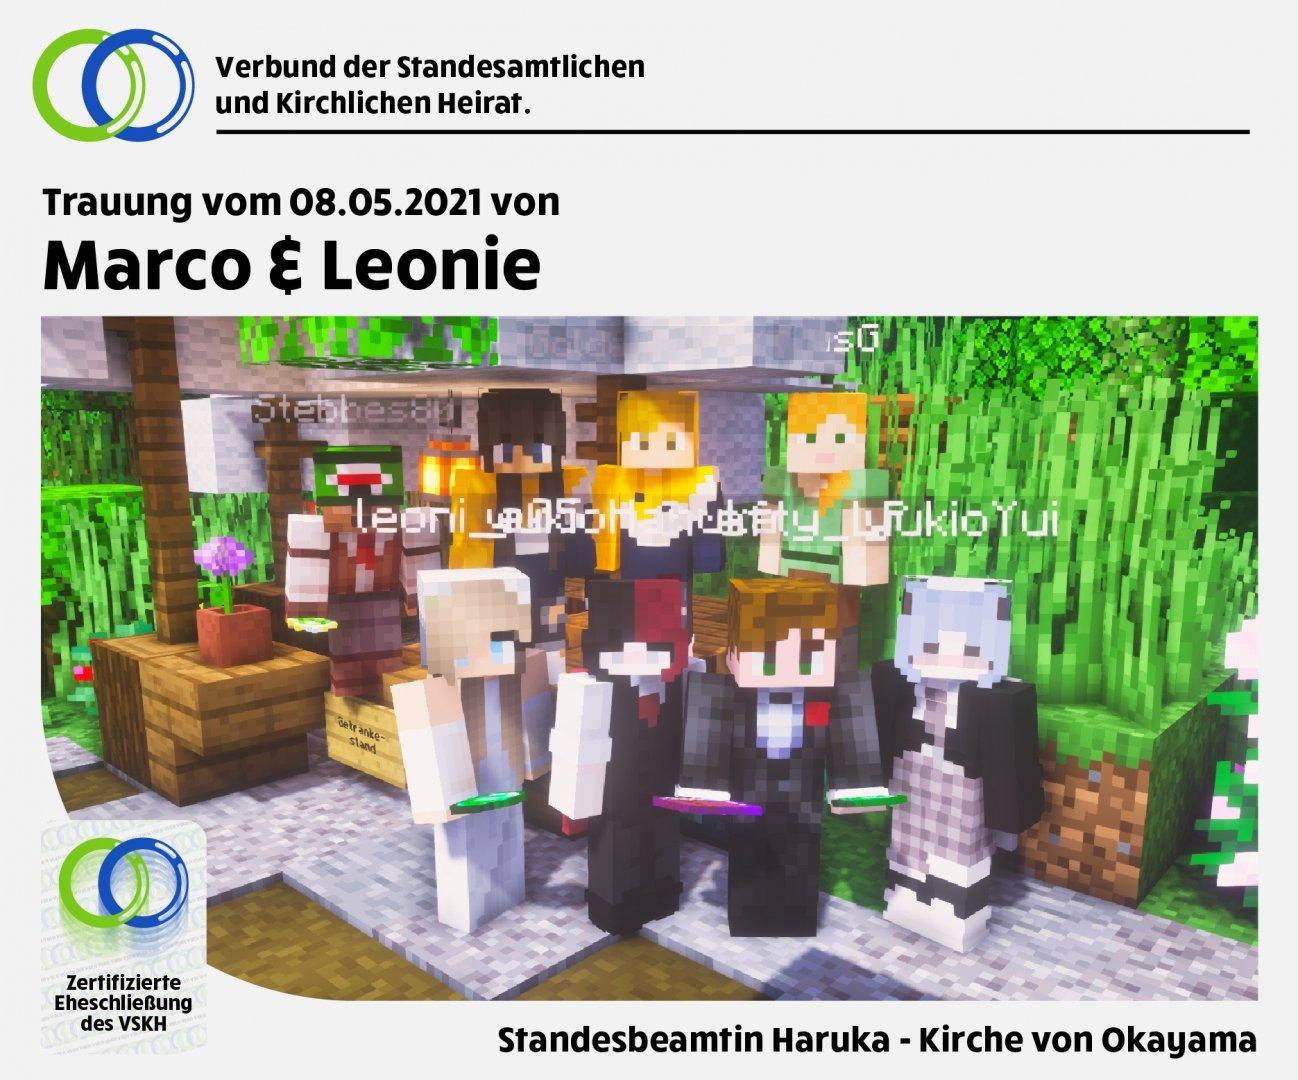 trauung-marco-leonie.jpg